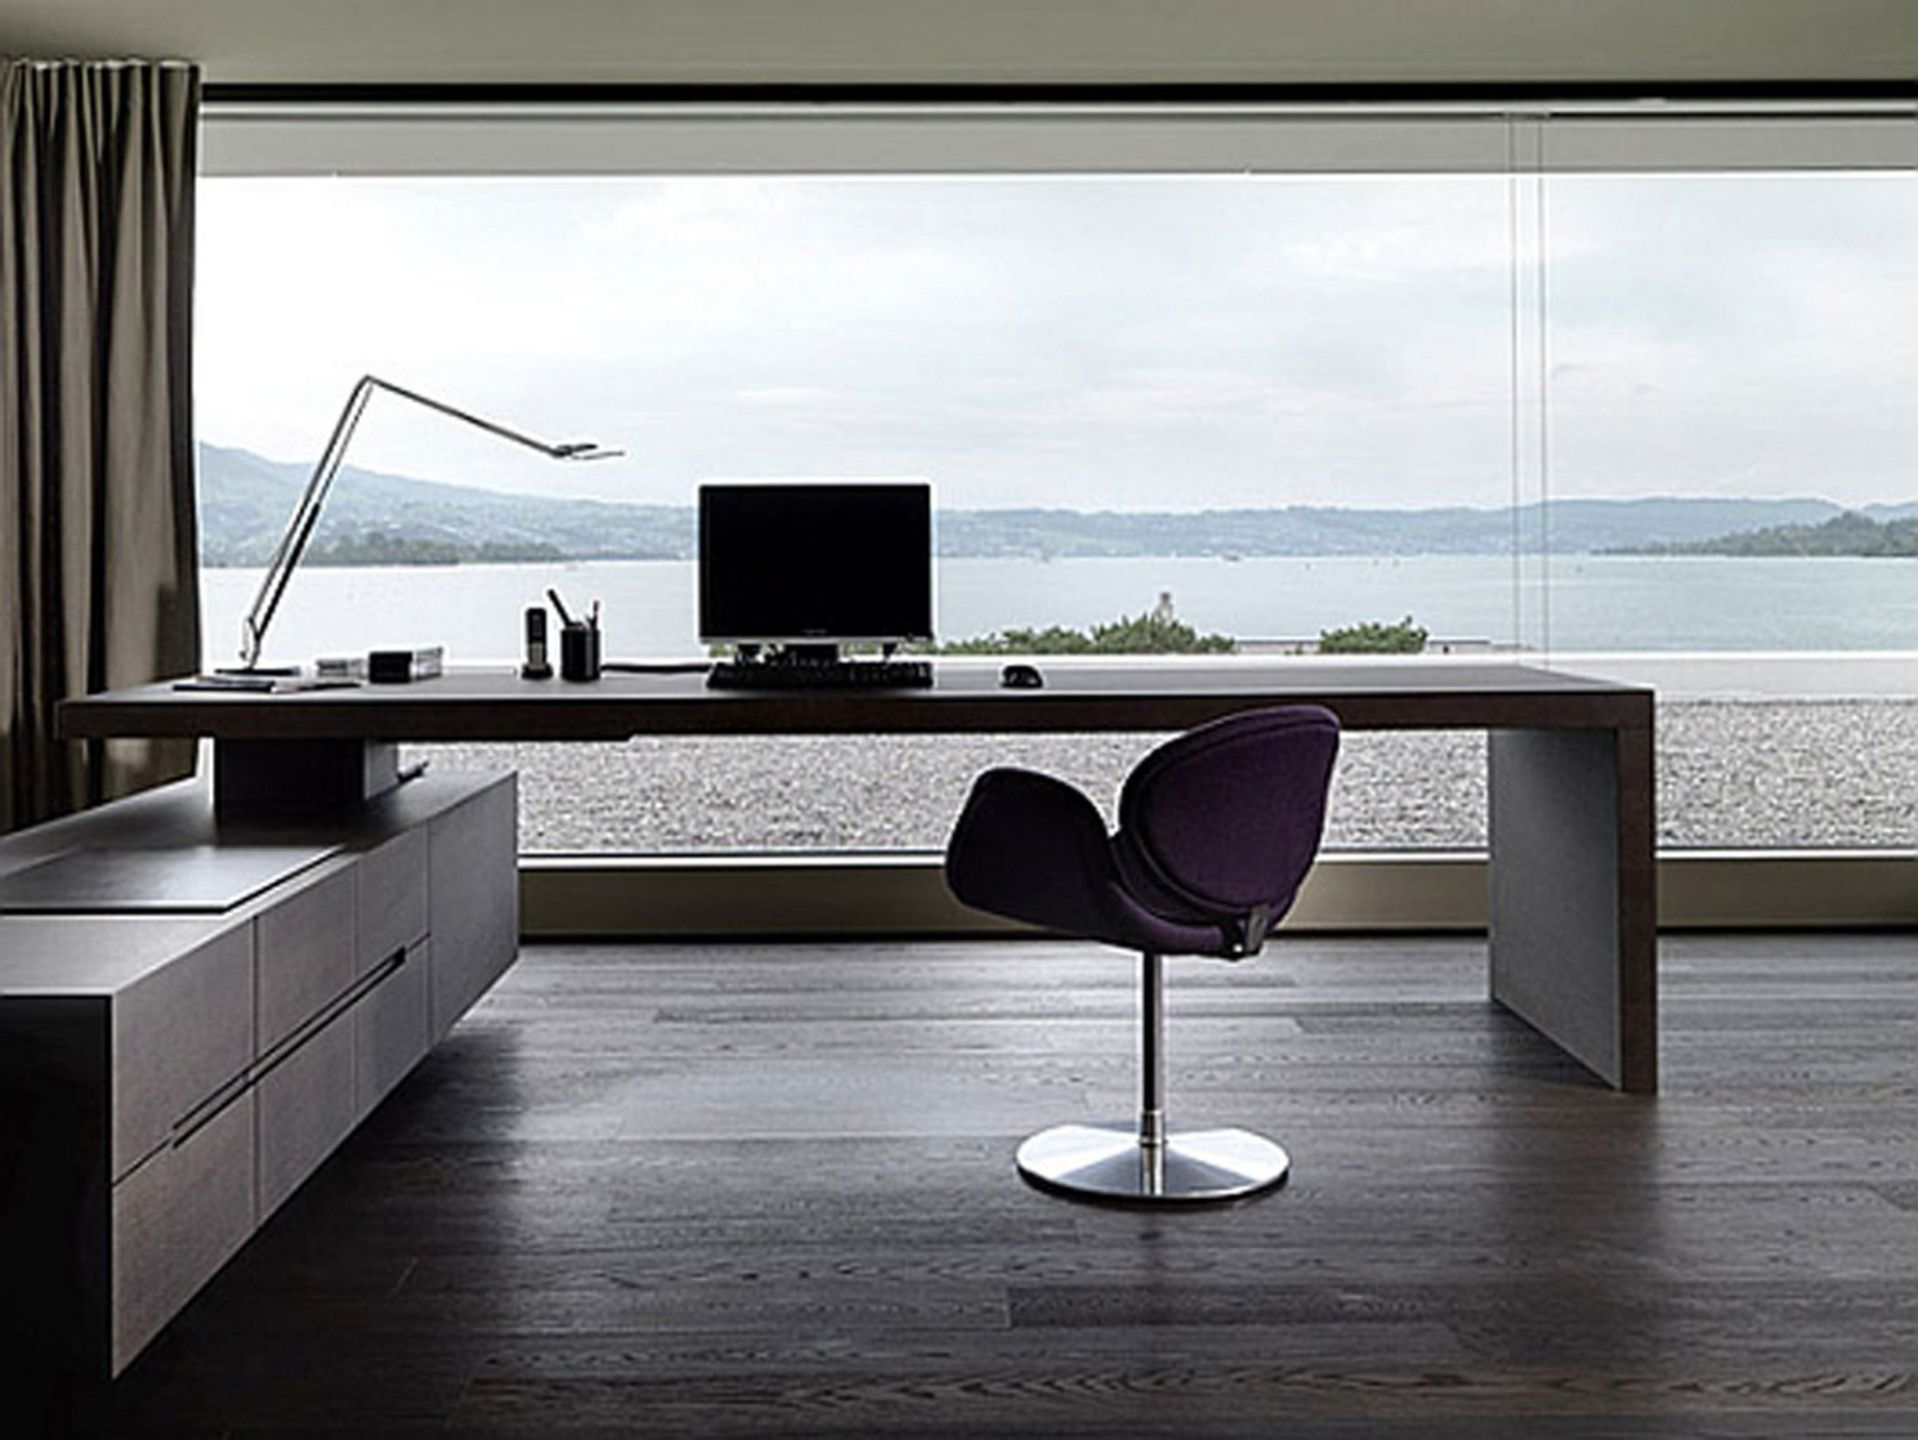 Image Of Furniture Modern Minimalist Computer Desk With White Computer Inside Minima Modern Office Interiors Modern Home Office Desk Office Design Inspiration